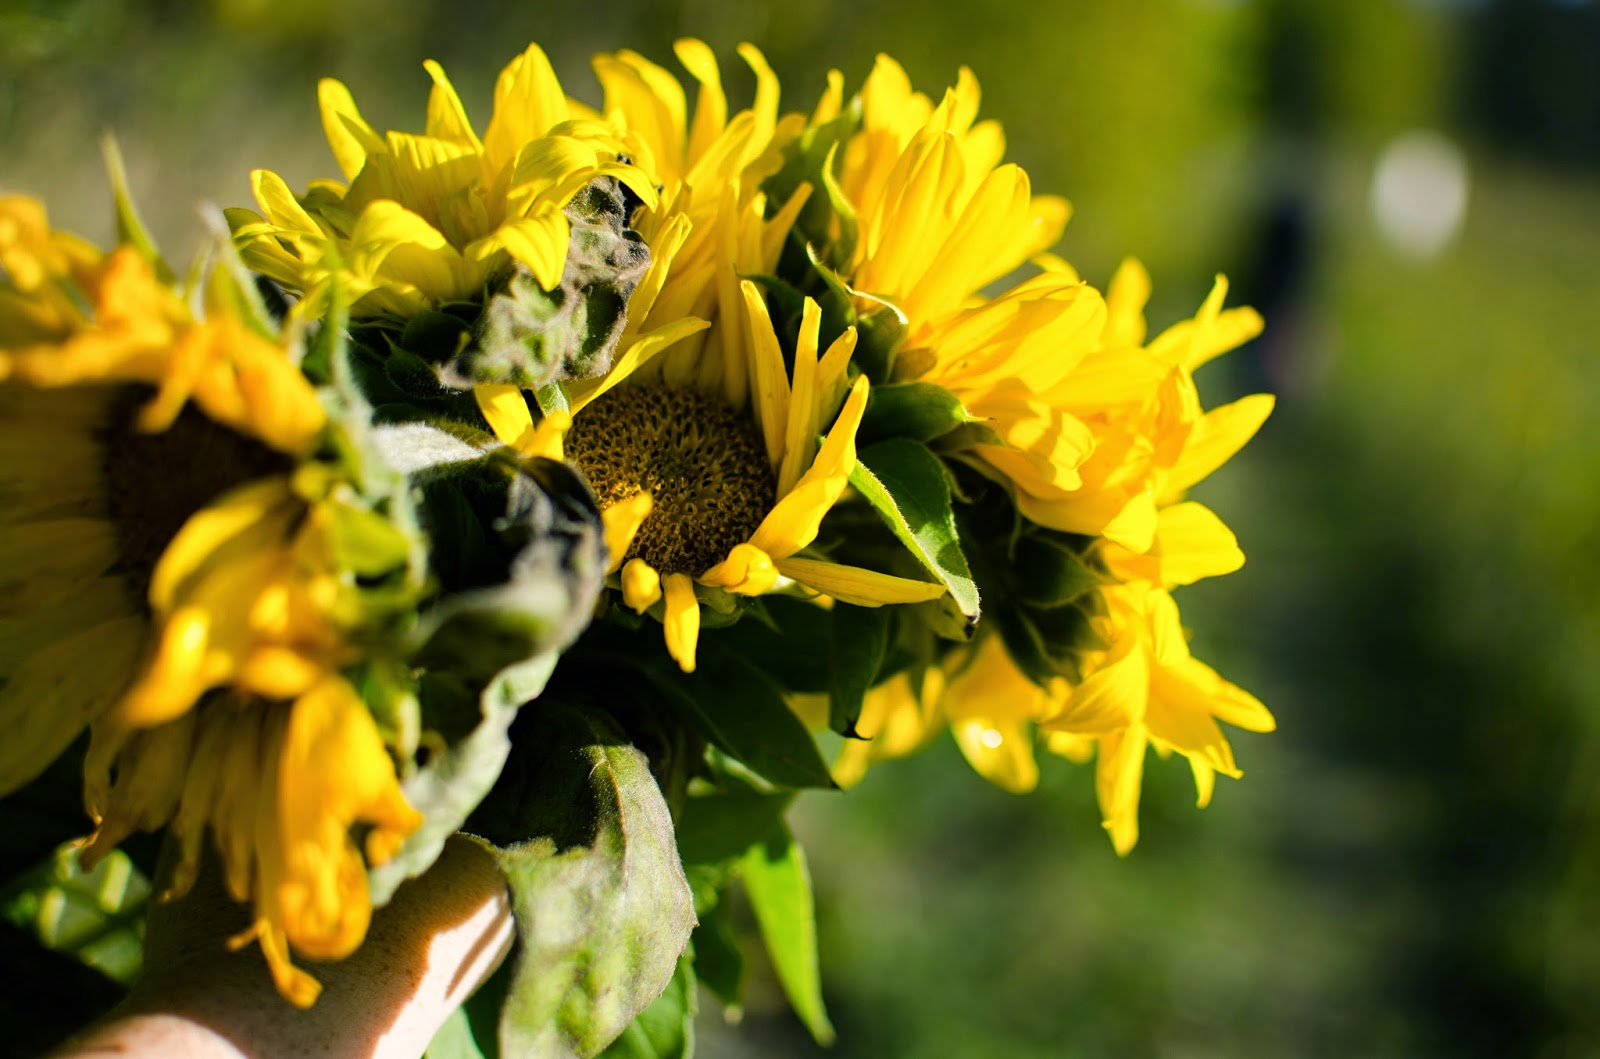 sunflower fields 2 by - photo #27